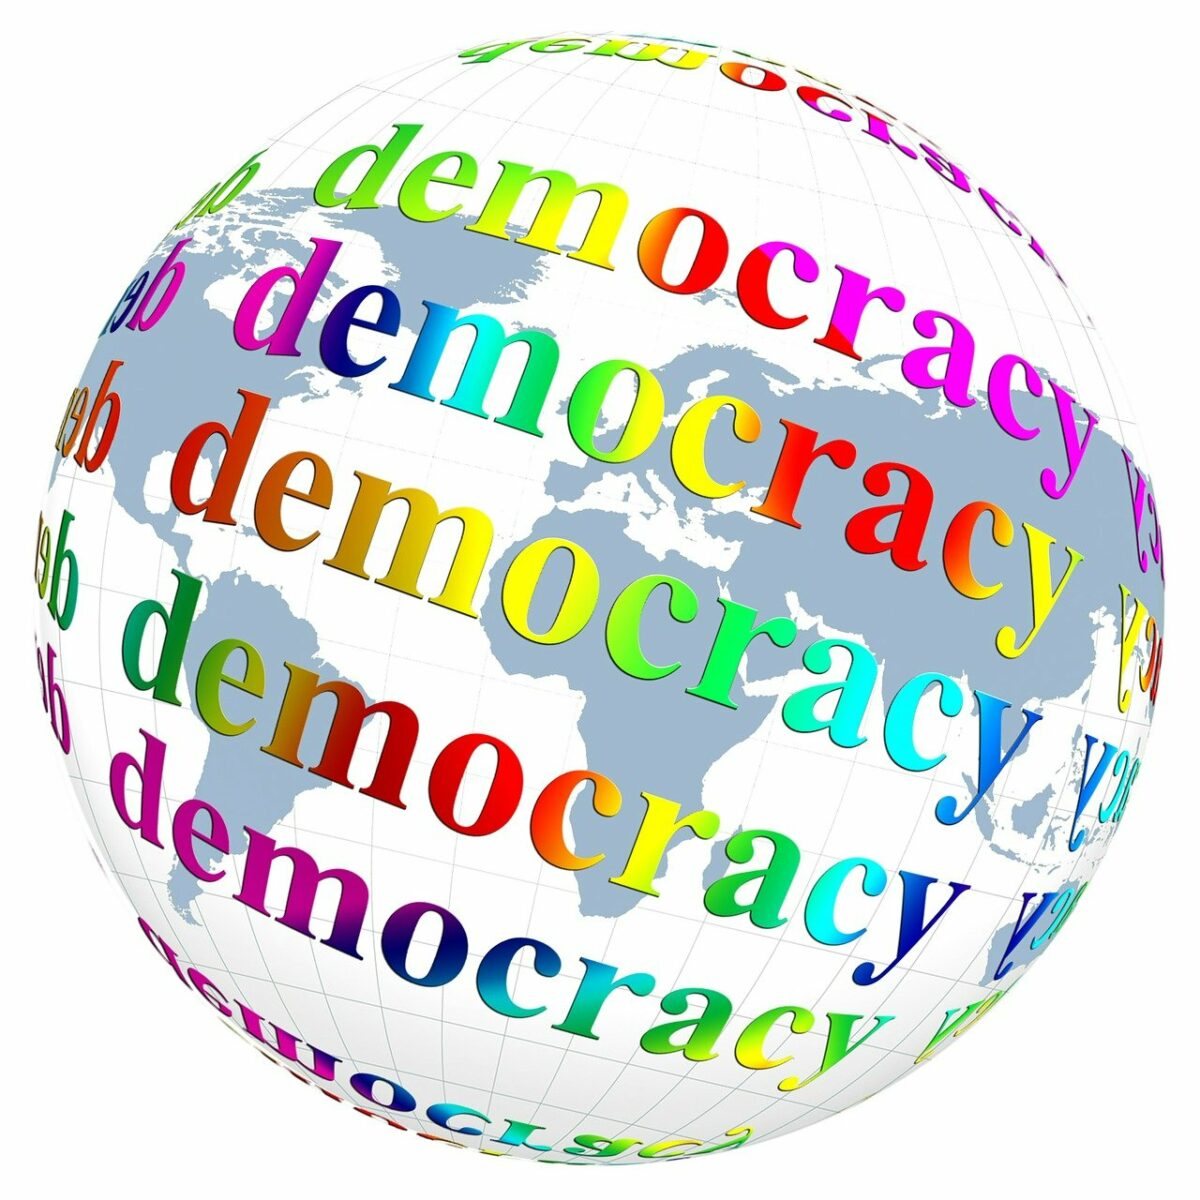 Terra Utopia - Diskussionsrunde Globale Demokratie